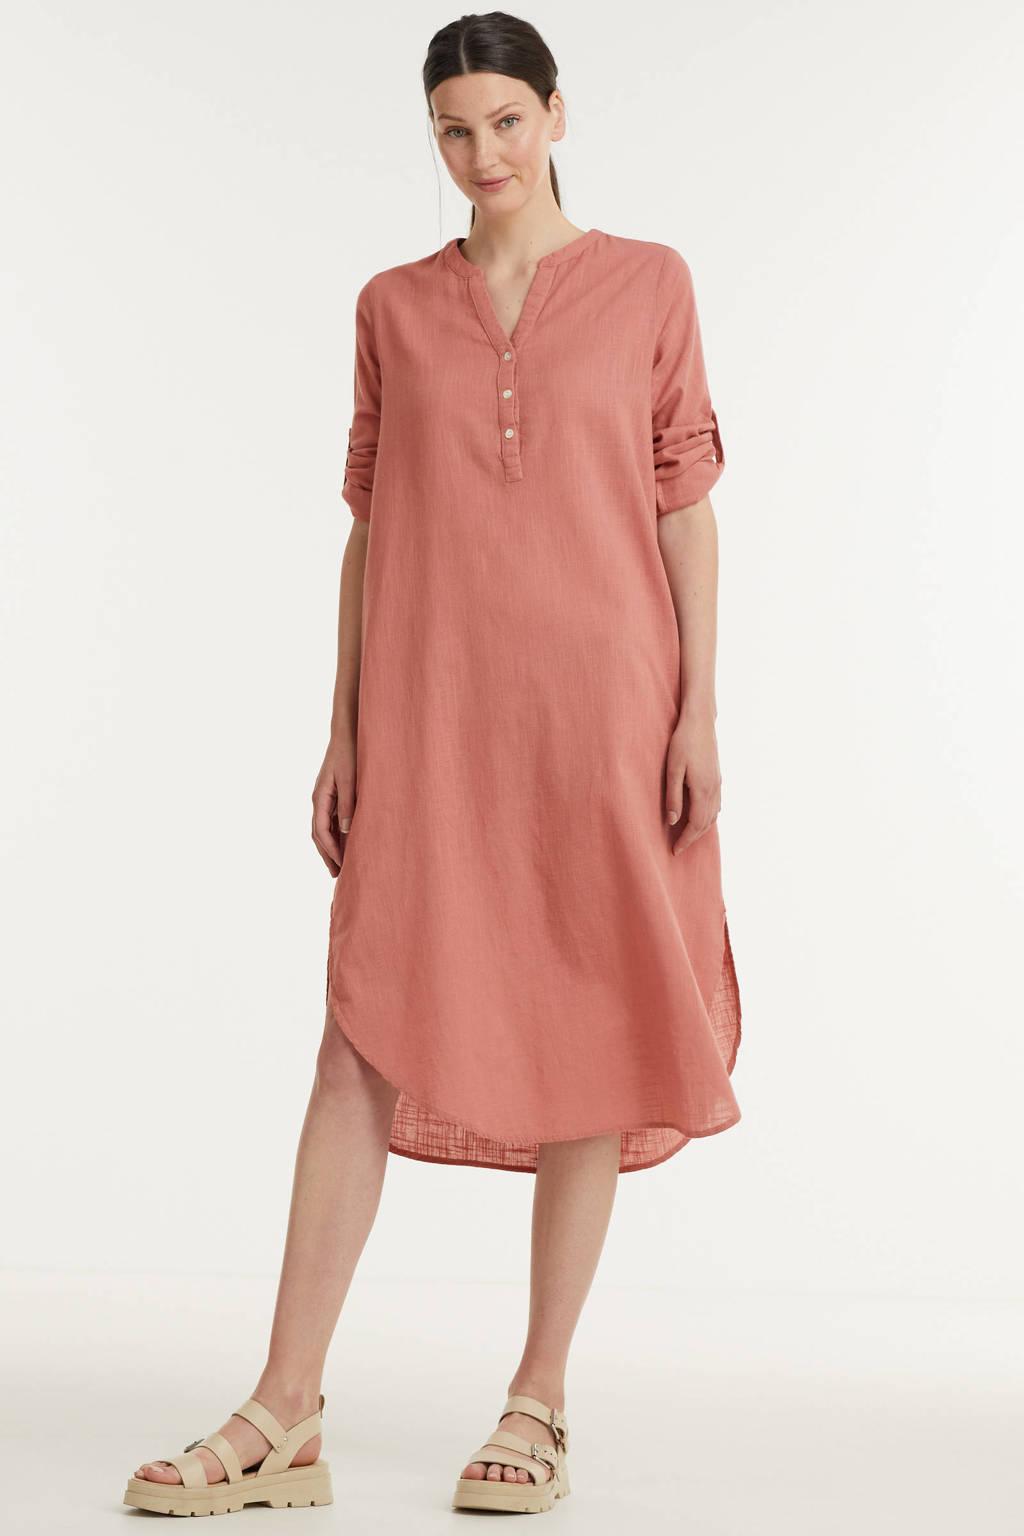 B.Young jurk oudroze, Oudroze